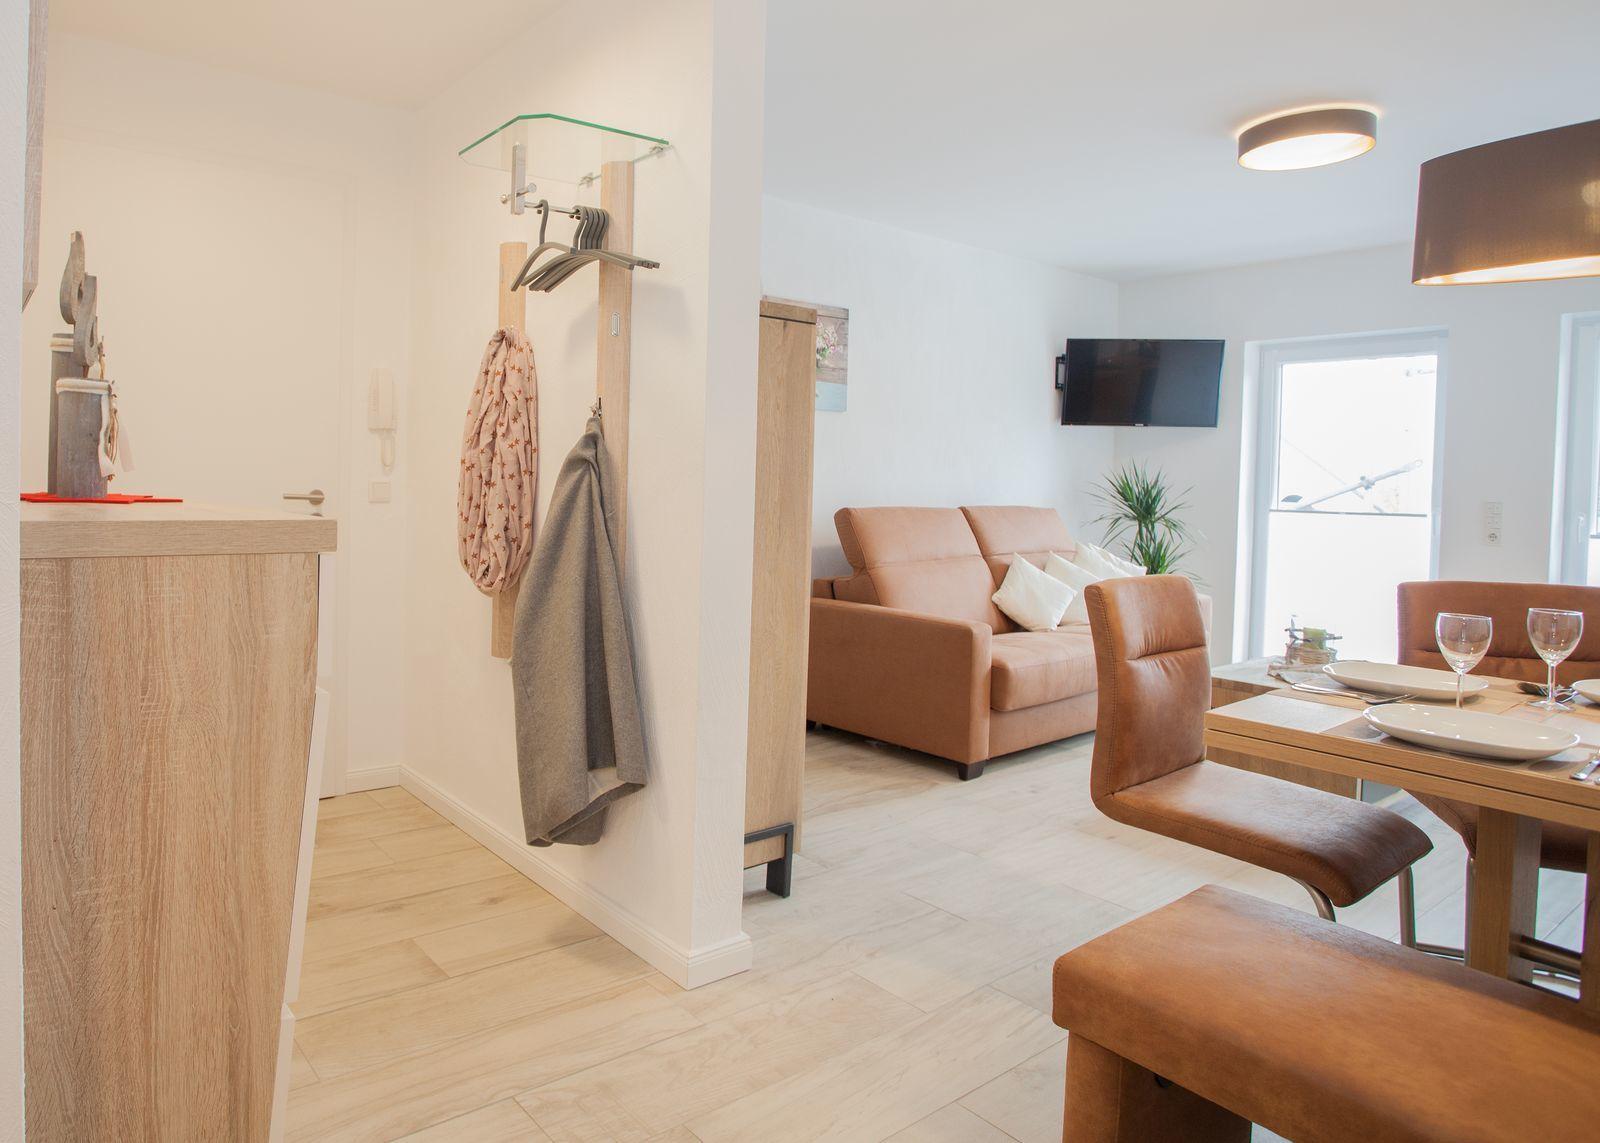 Apartment - Kappenblick 2 (Buchenweg 13) |  Winterberg